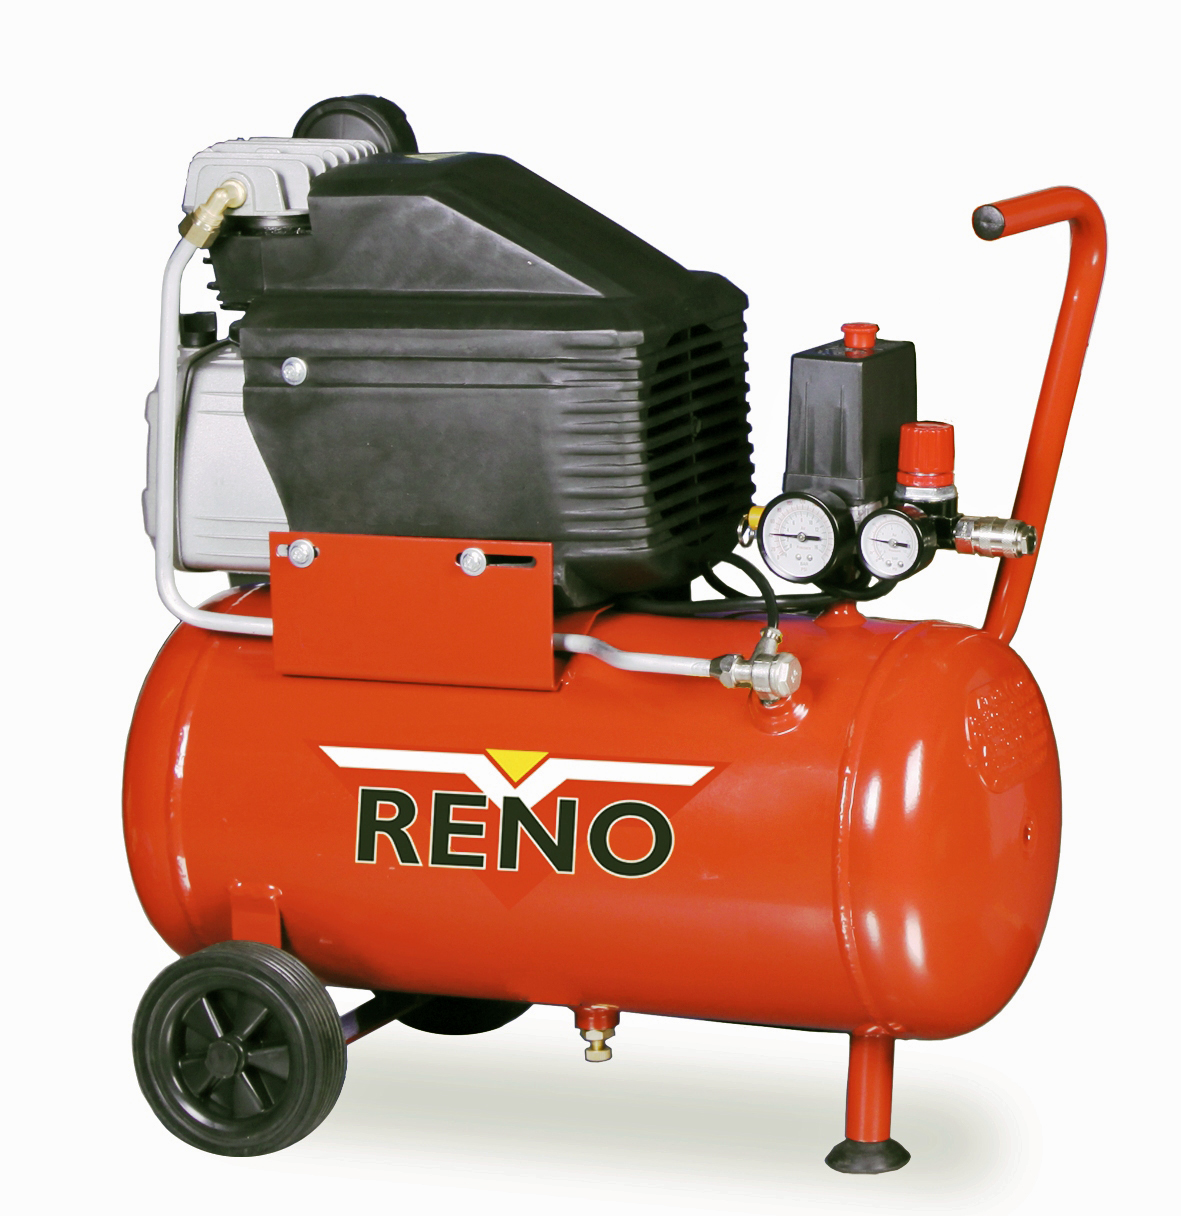 RENO 235/24 Image